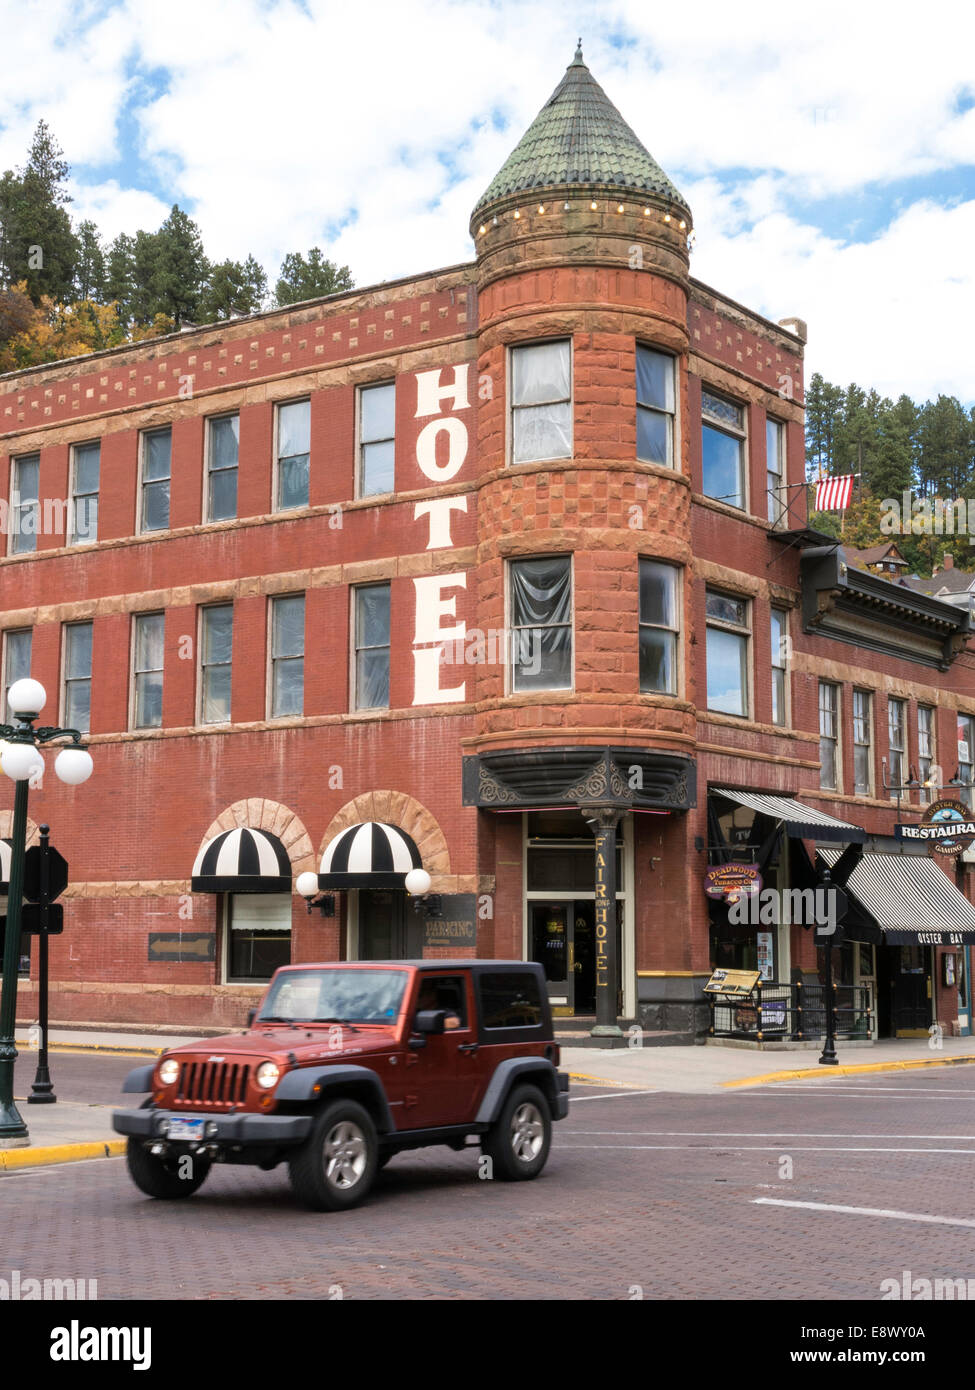 Historic Main Street in Deadwood, South Dakota, USA - Stock Image